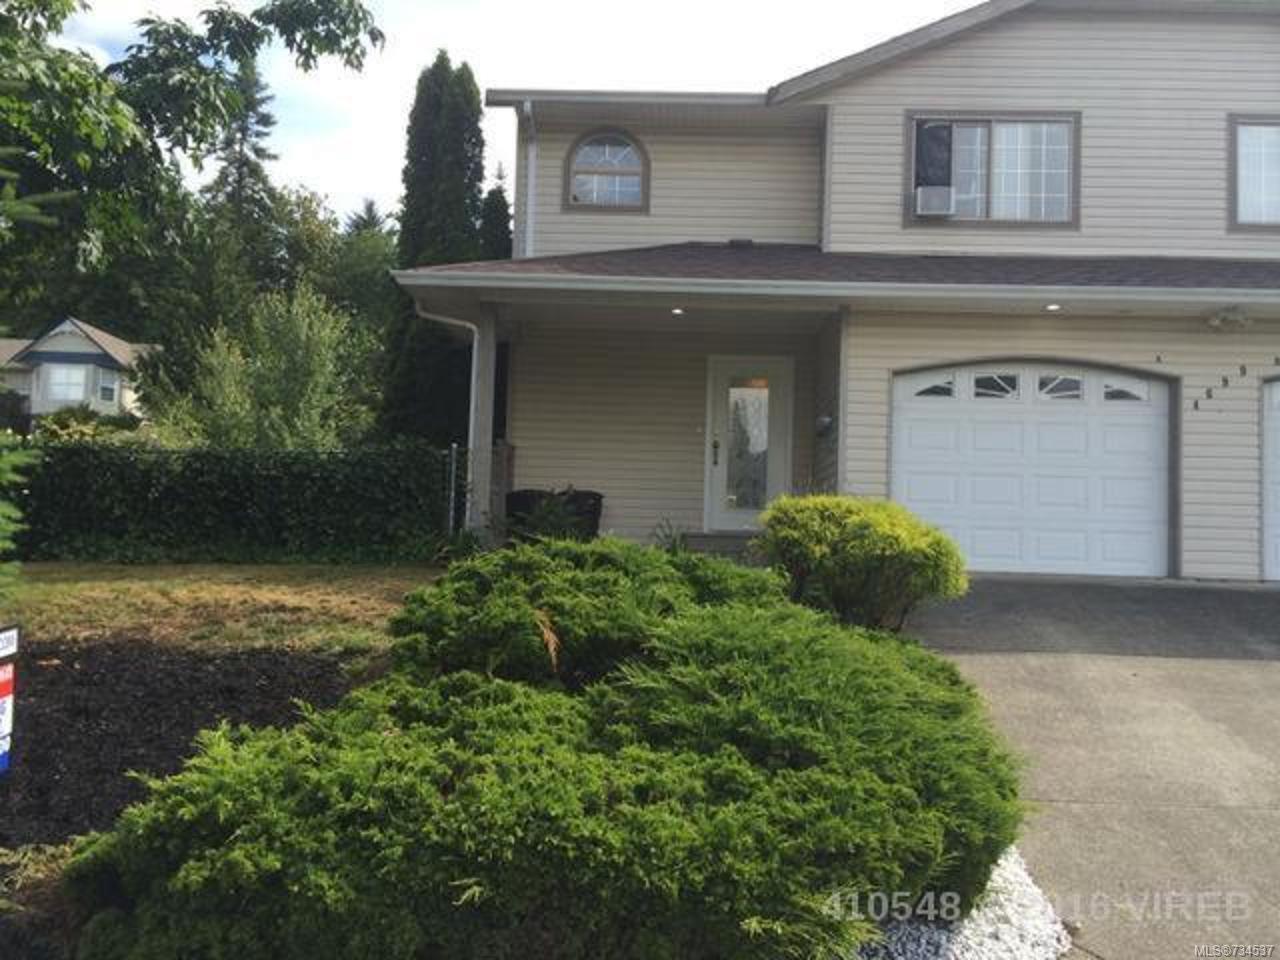 Main Photo: A 4699 SHETLAND PLACE in COURTENAY: CV Courtenay East Half Duplex for sale (Comox Valley)  : MLS®# 734537